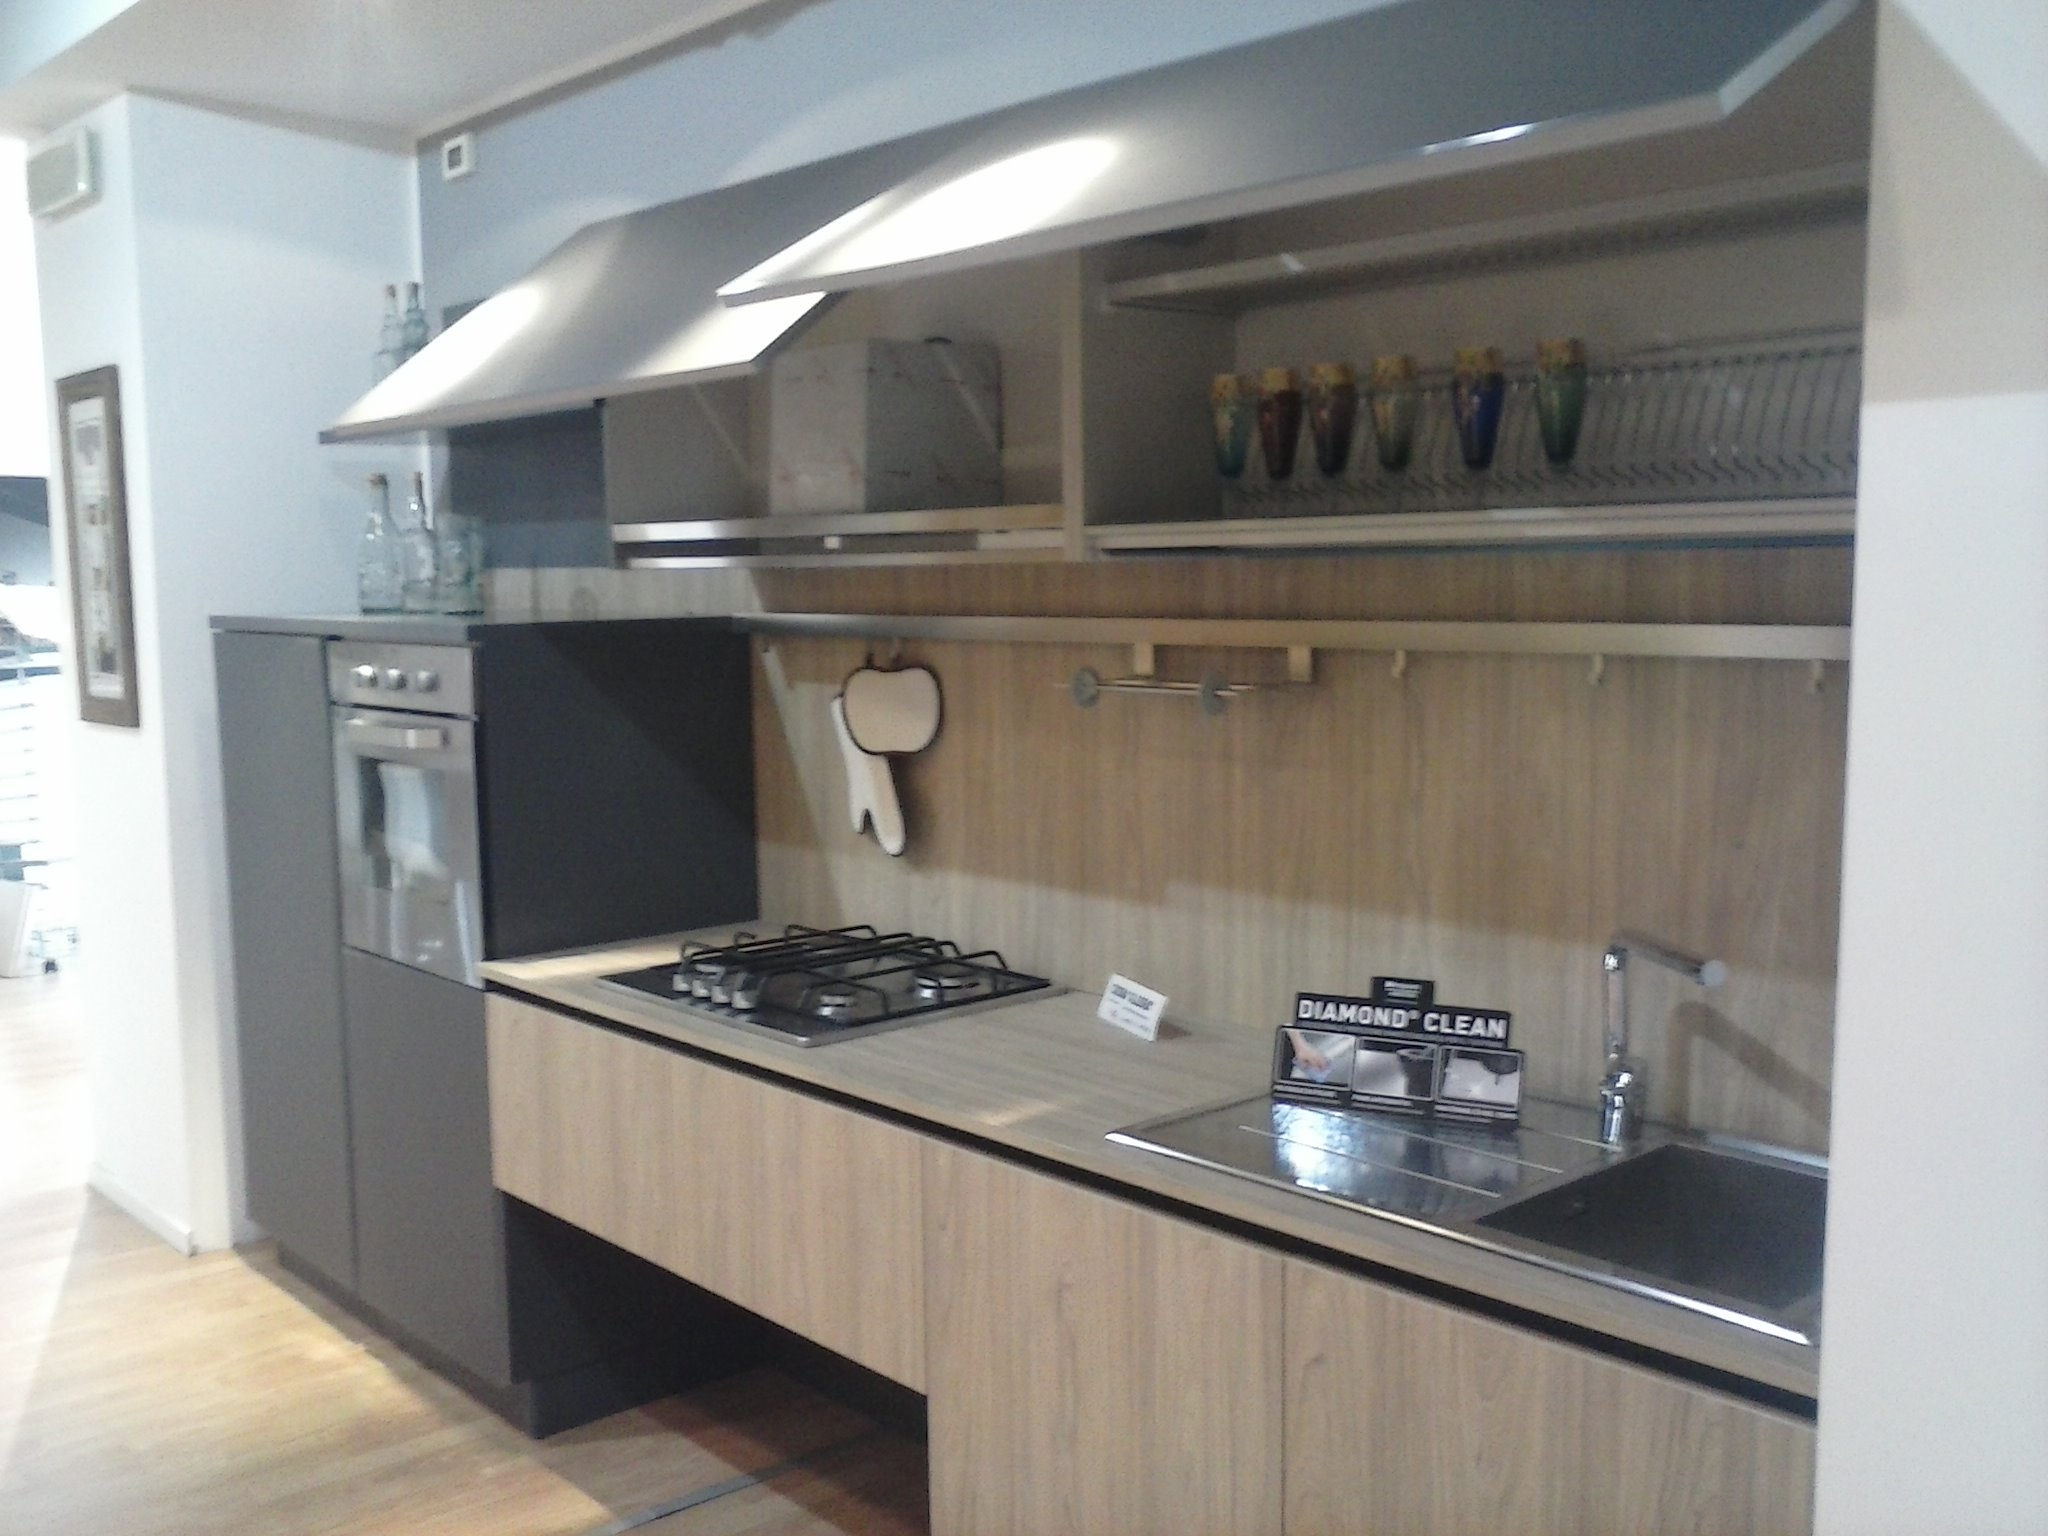 Cucina stosa cucine aleve 39 moderna laminato materico neutra cucine a prezzi scontati - Cucina stosa prezzi ...